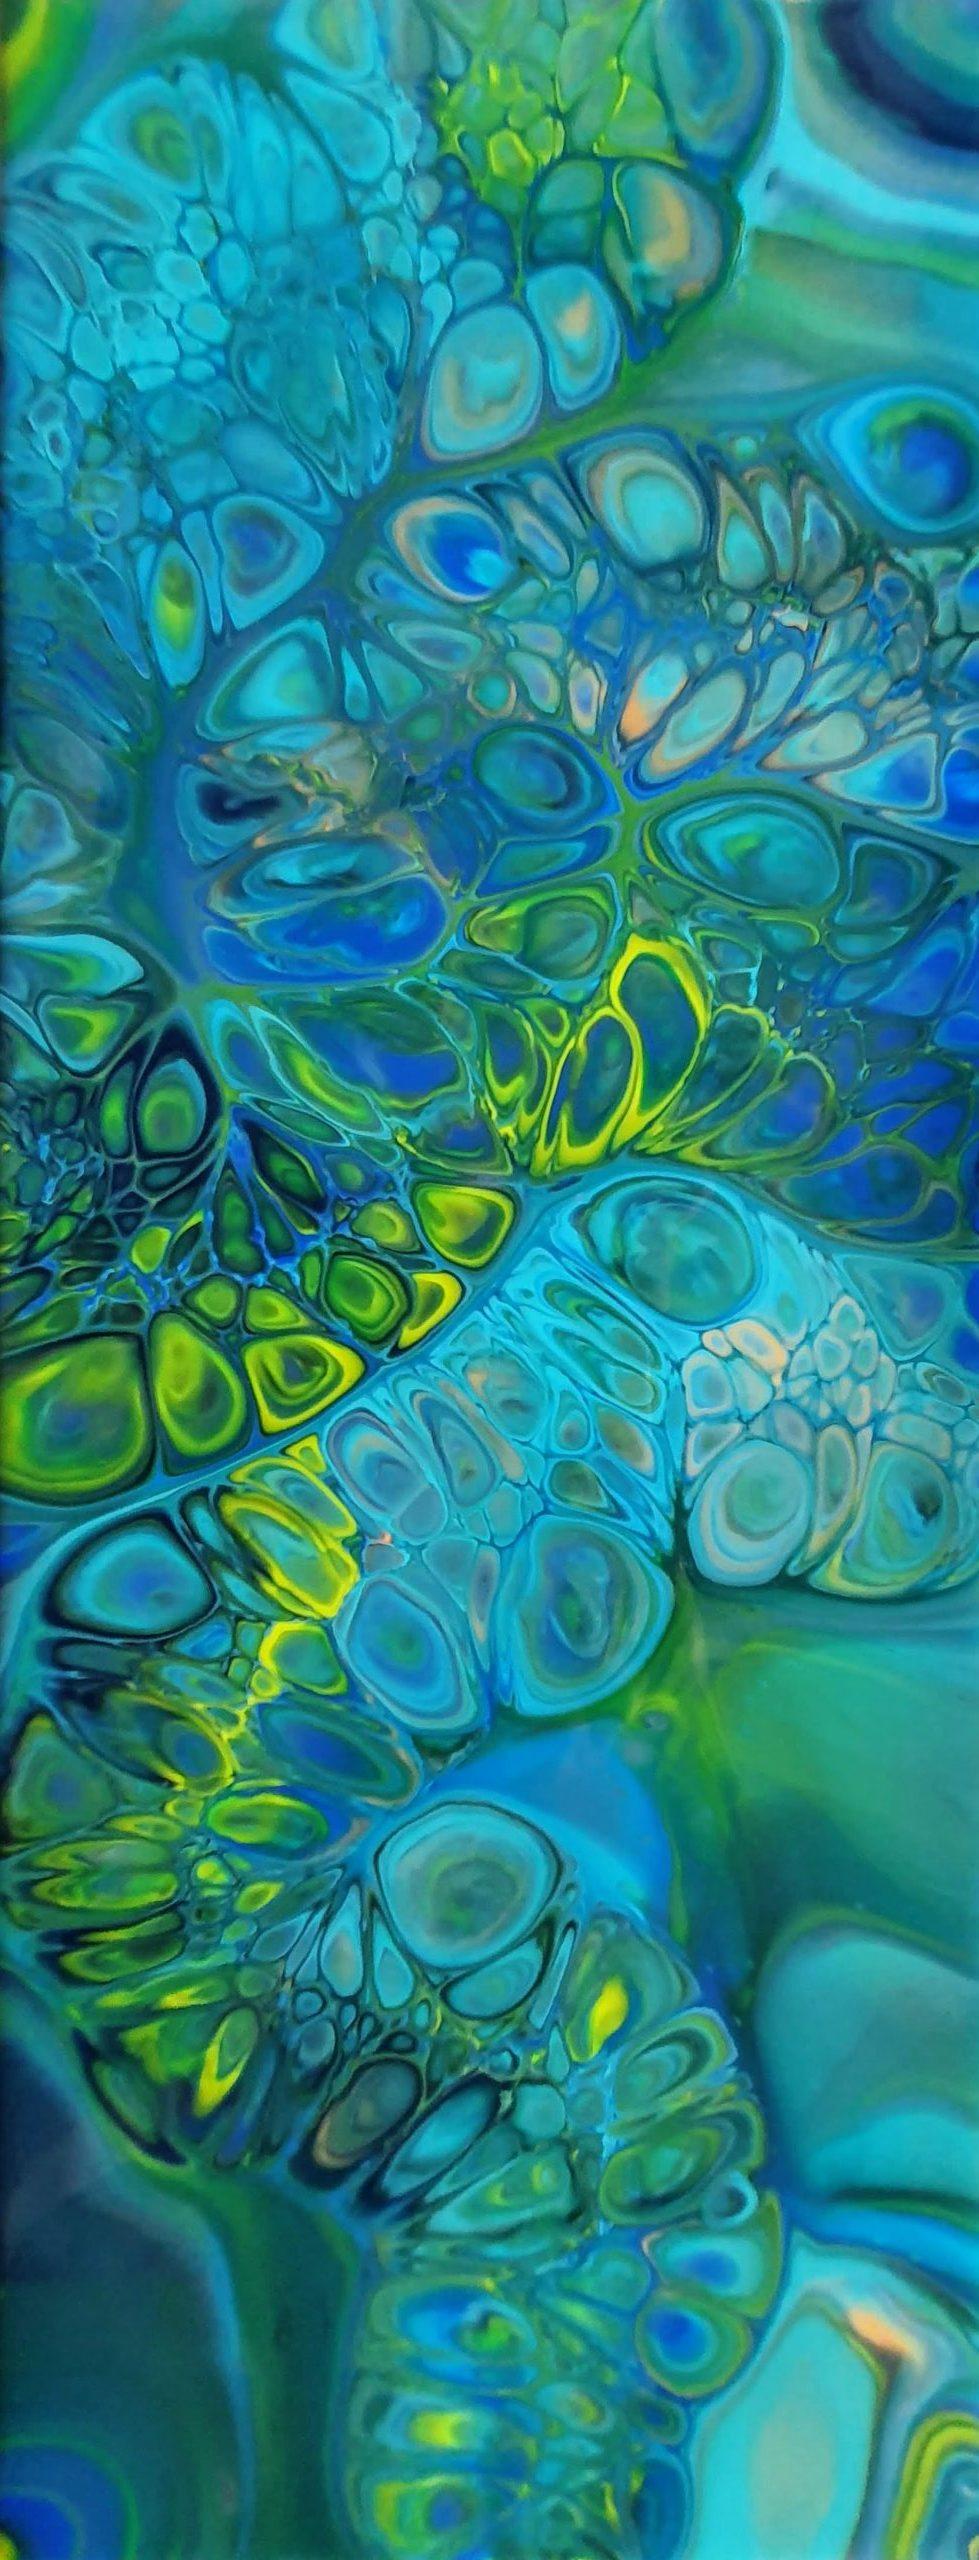 Unterwasser1 Fluidart Acrylgiessen Flipcup1